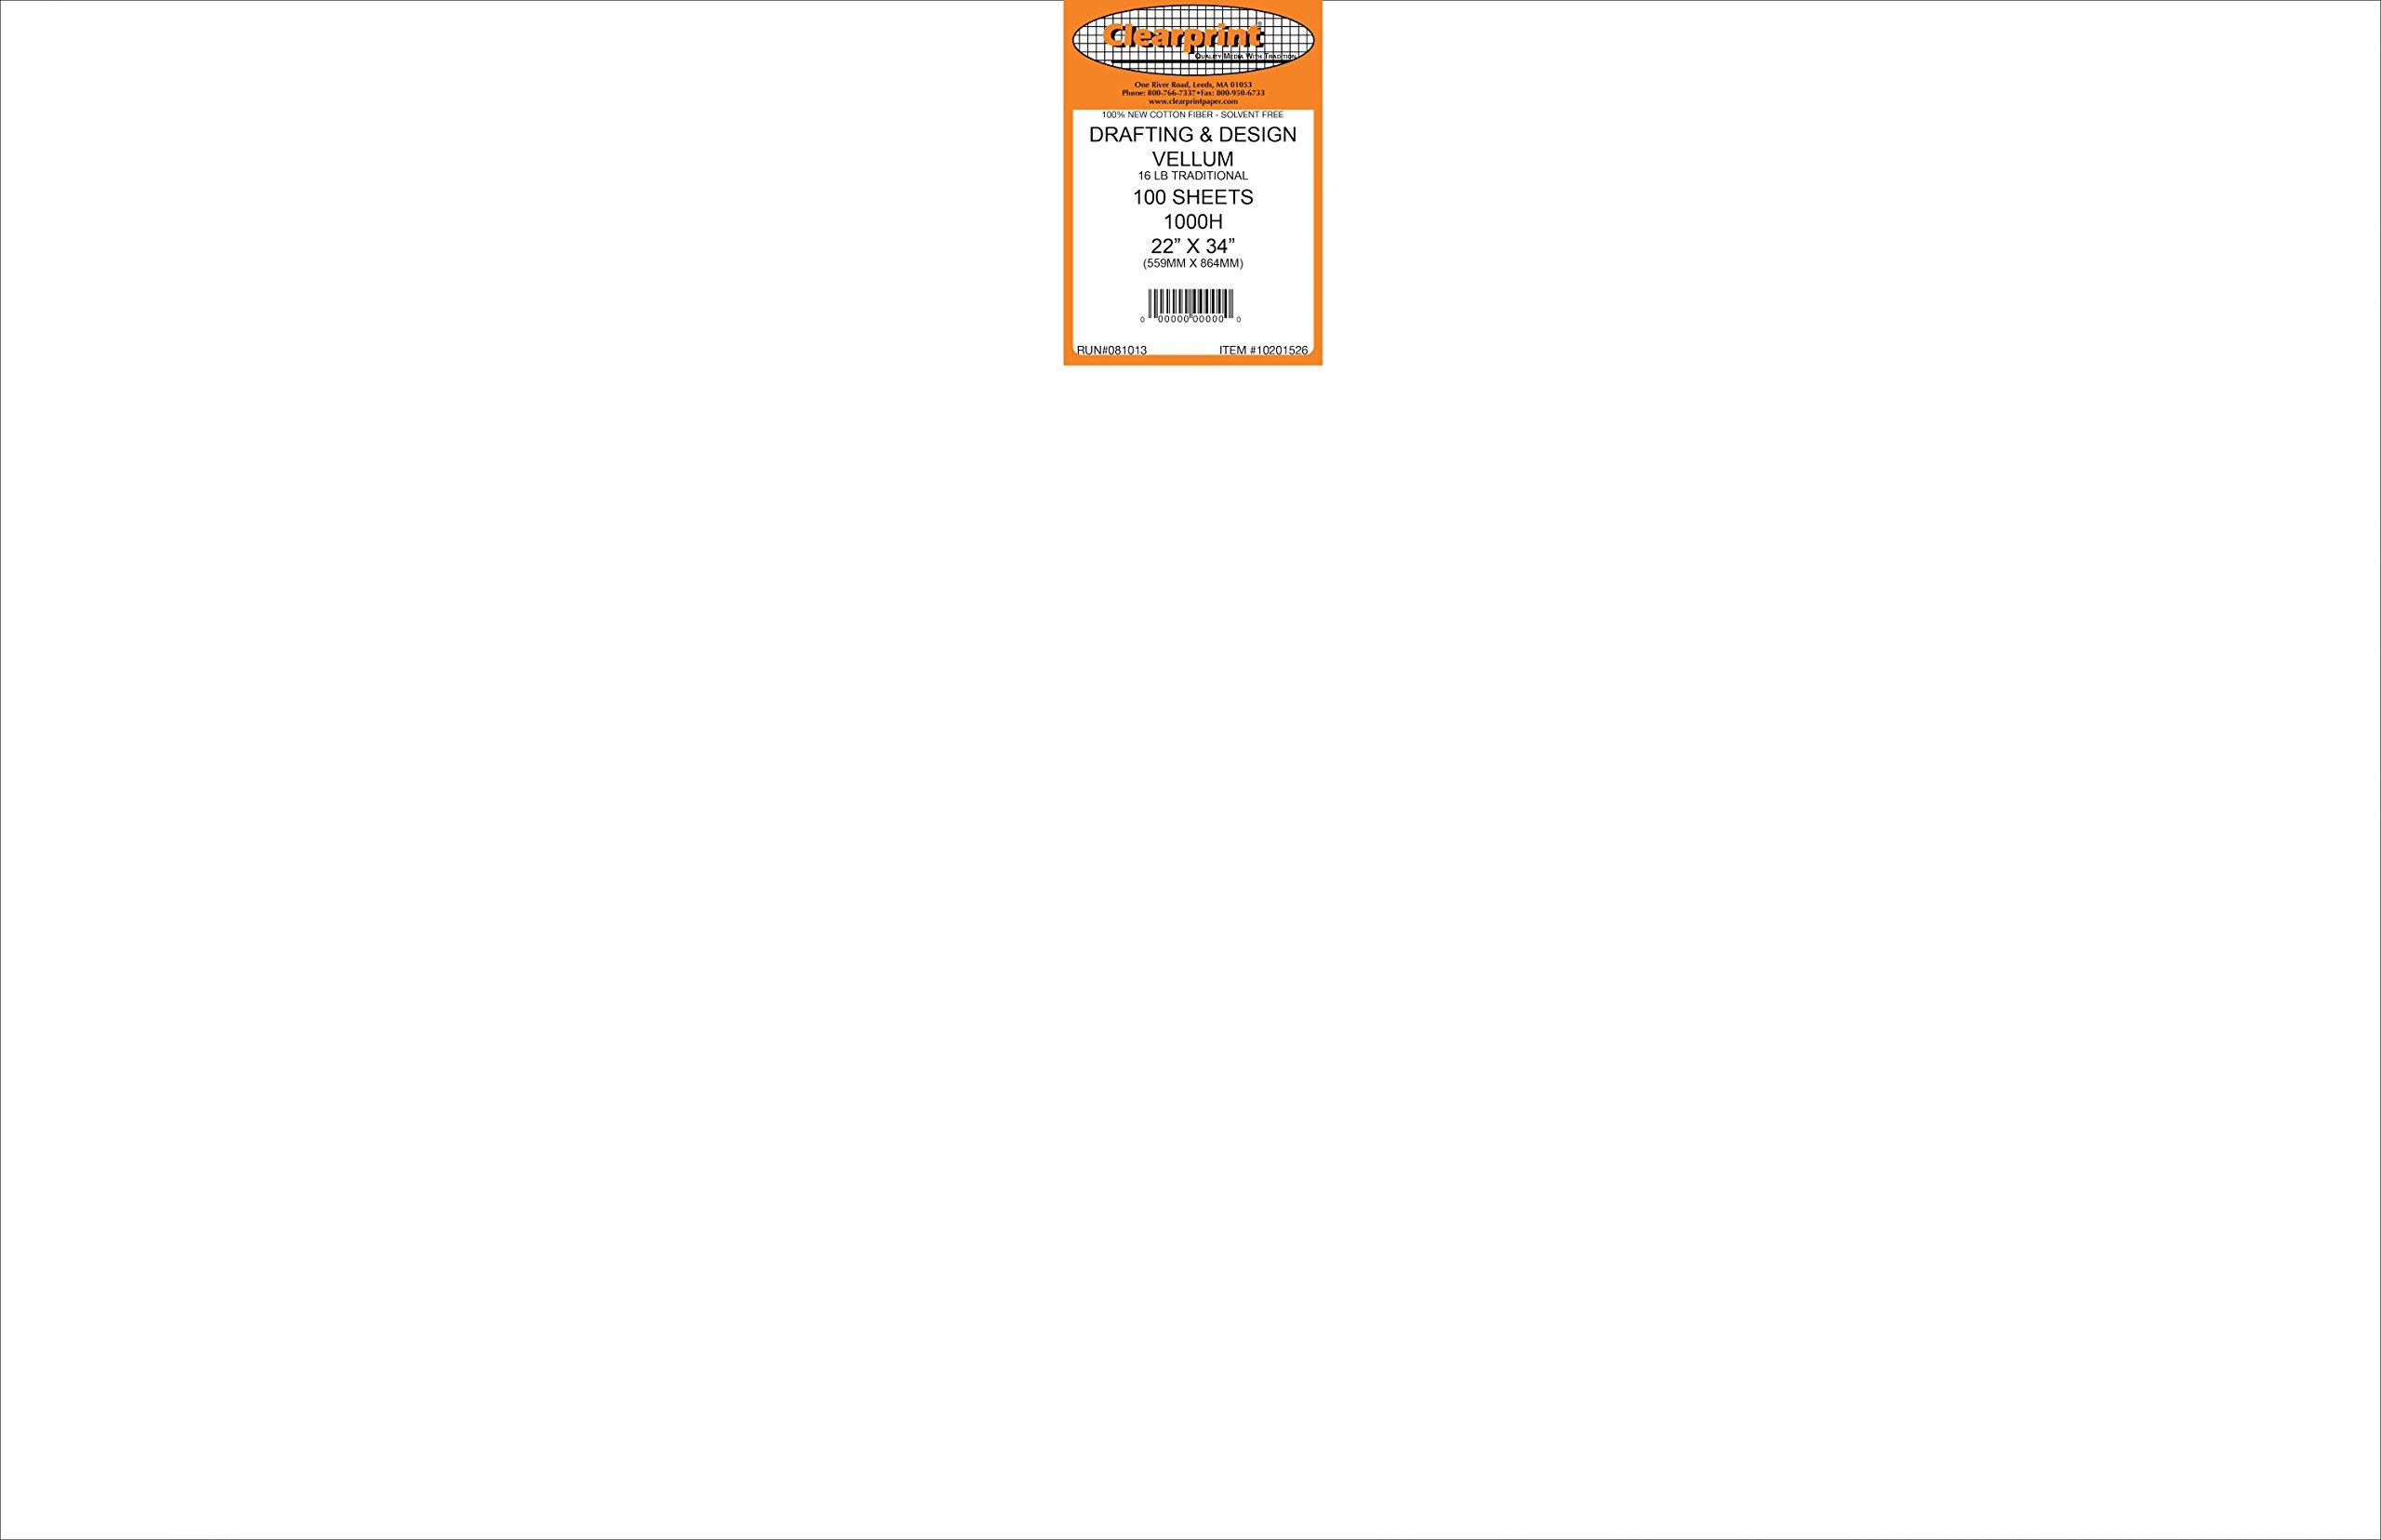 Clearprint 1000H Design Vellum Sheets, 16 lb., 100% Cotton, 22 x 34 Inches, 100 Sheets Per Pack, Translucent White, 1 Each (10201526)